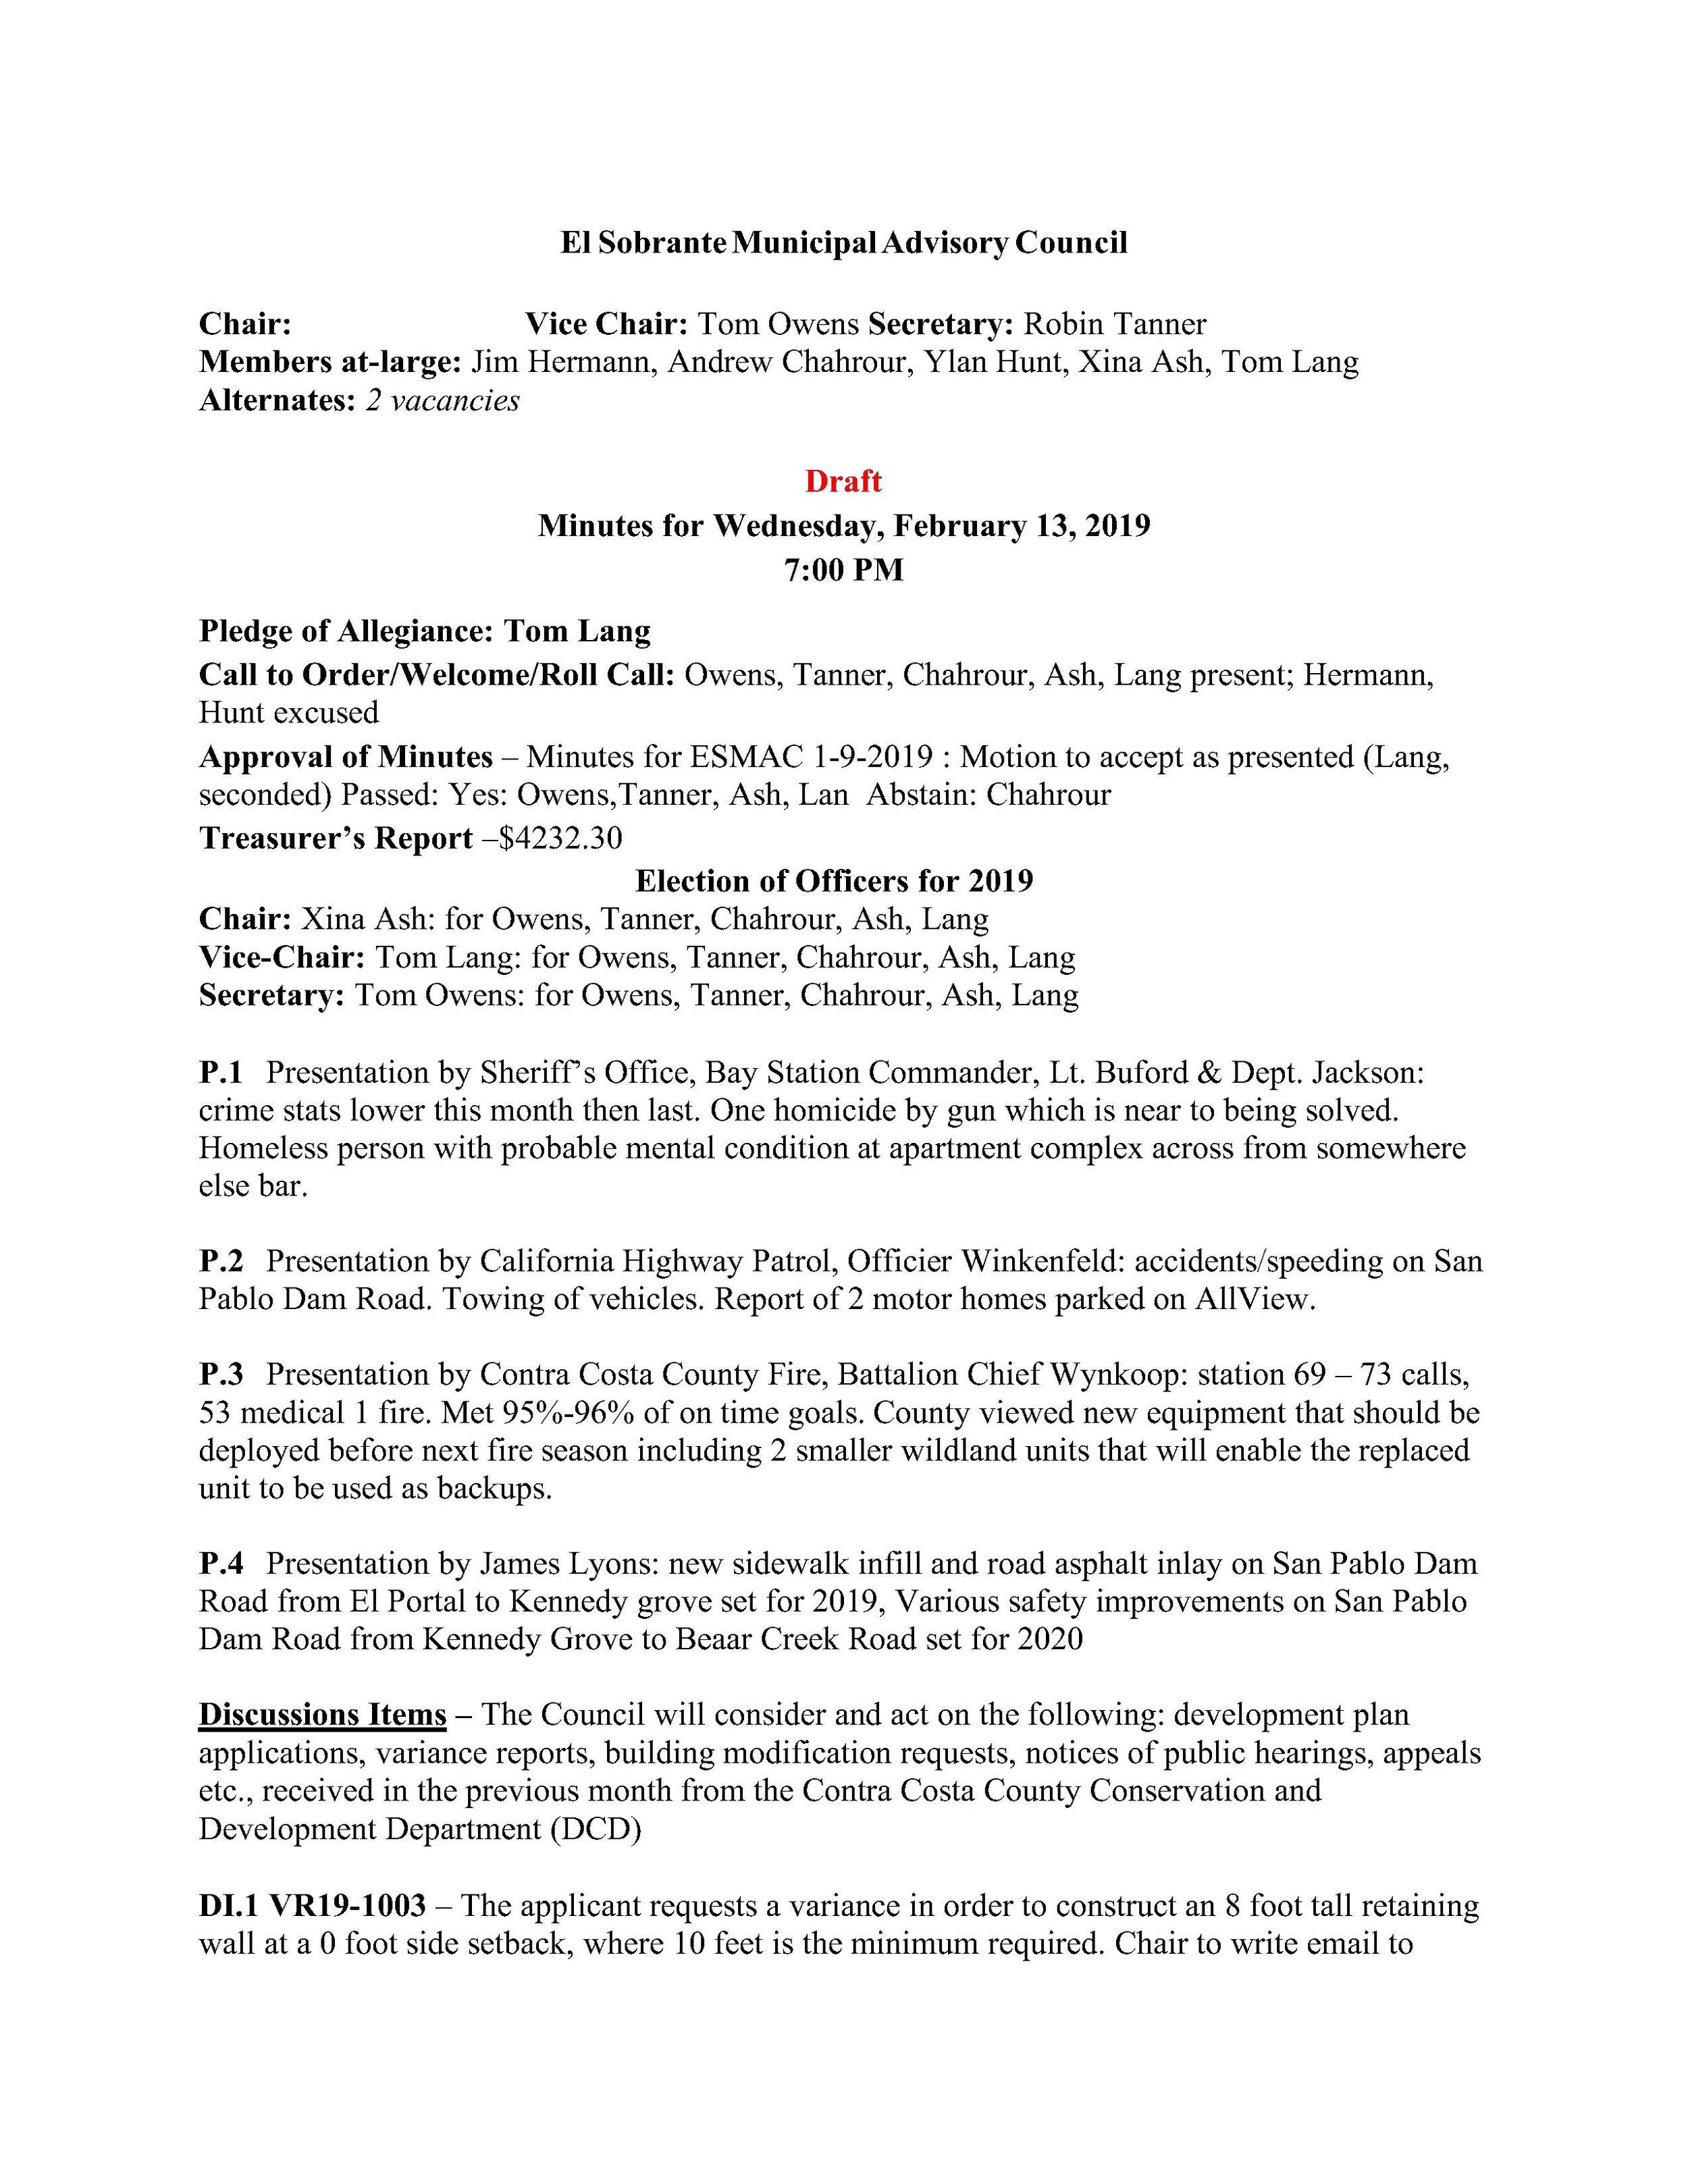 ESMAC Agenda 3.13.2019 (8 Pages)_3.jpg